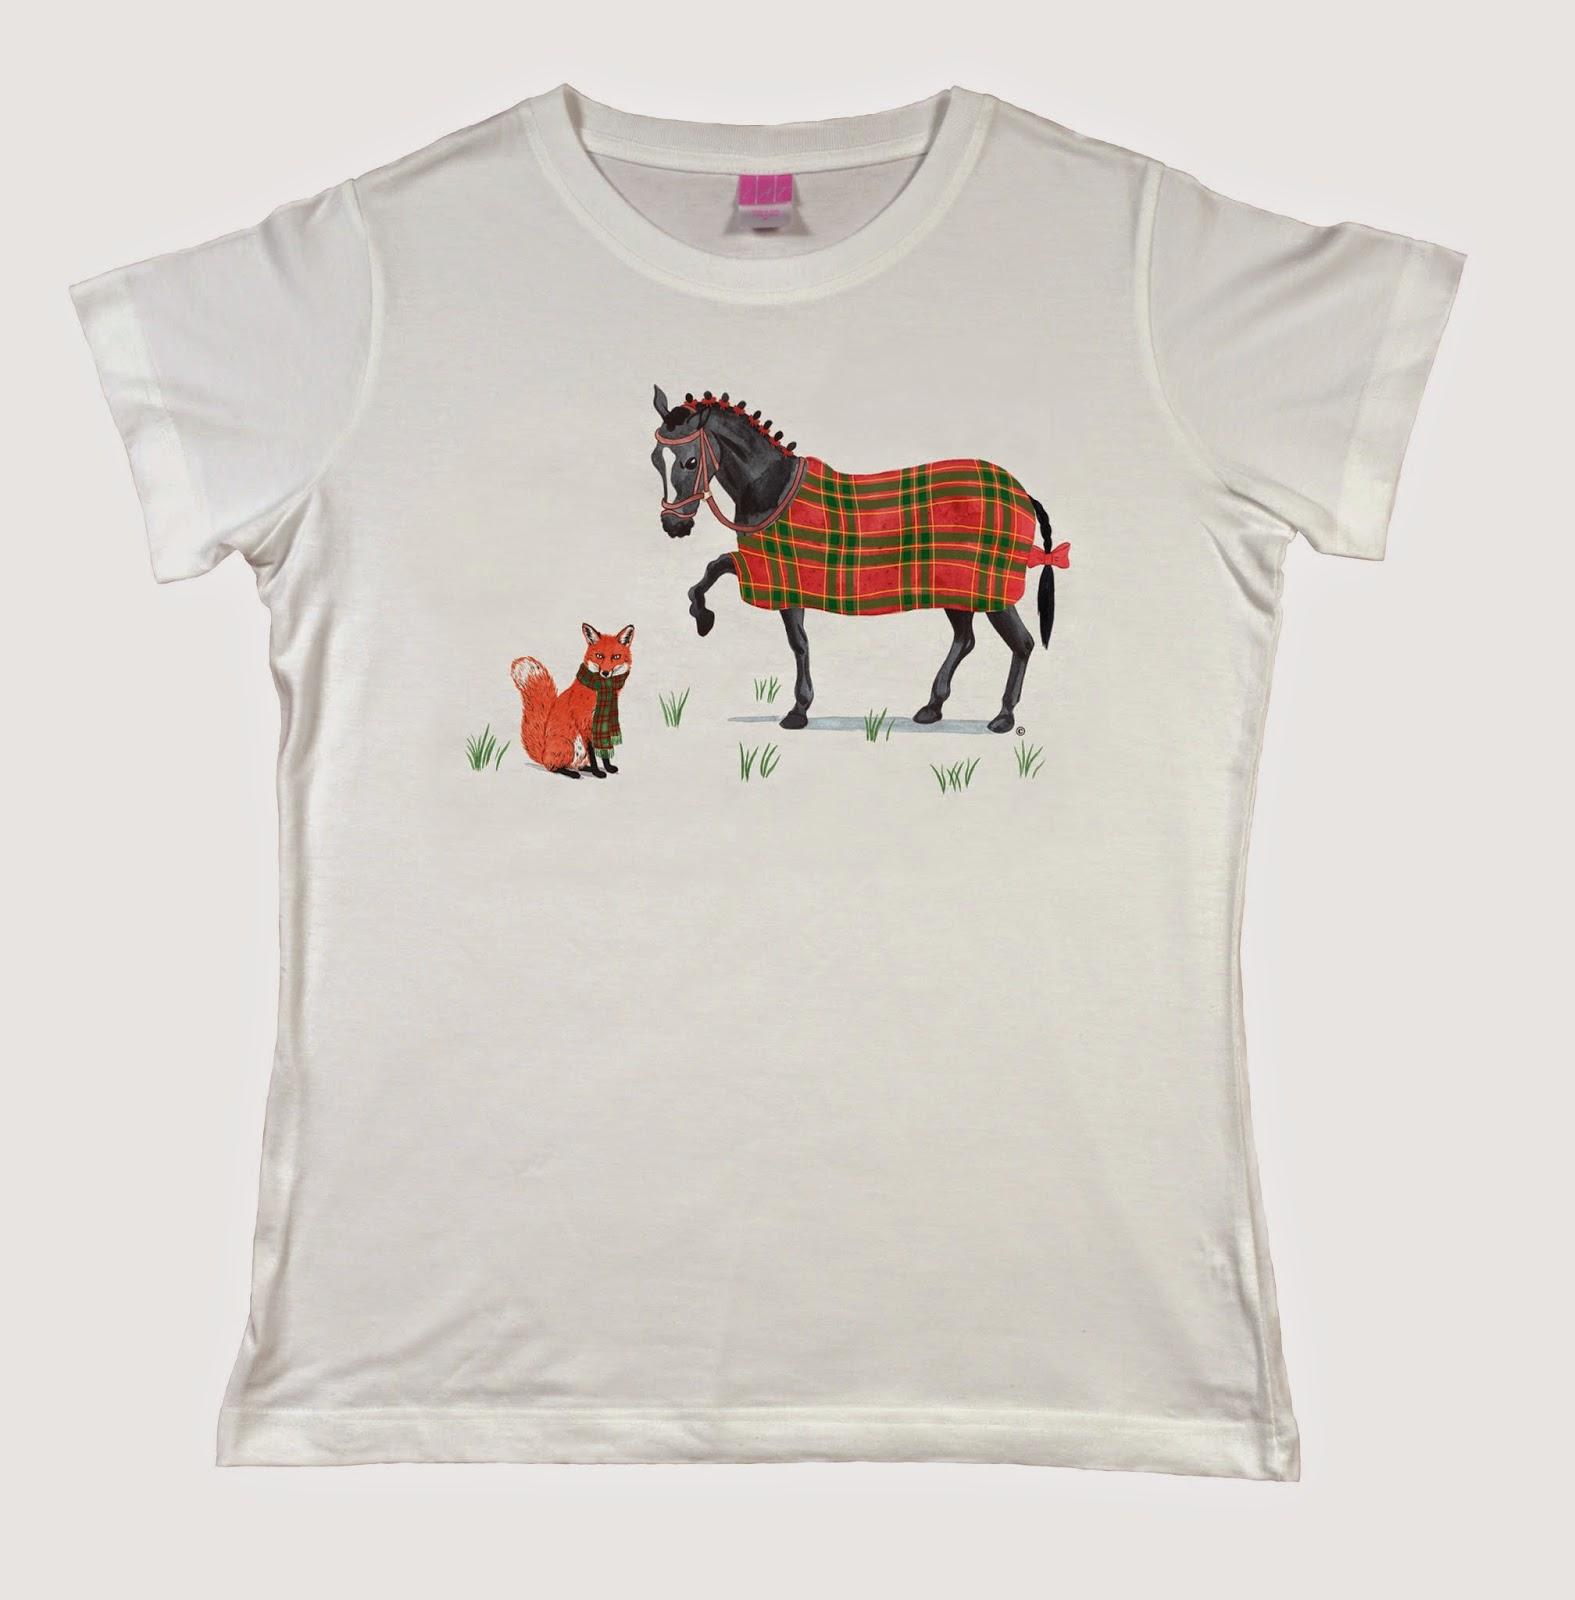 Chatham Ivy t shirts